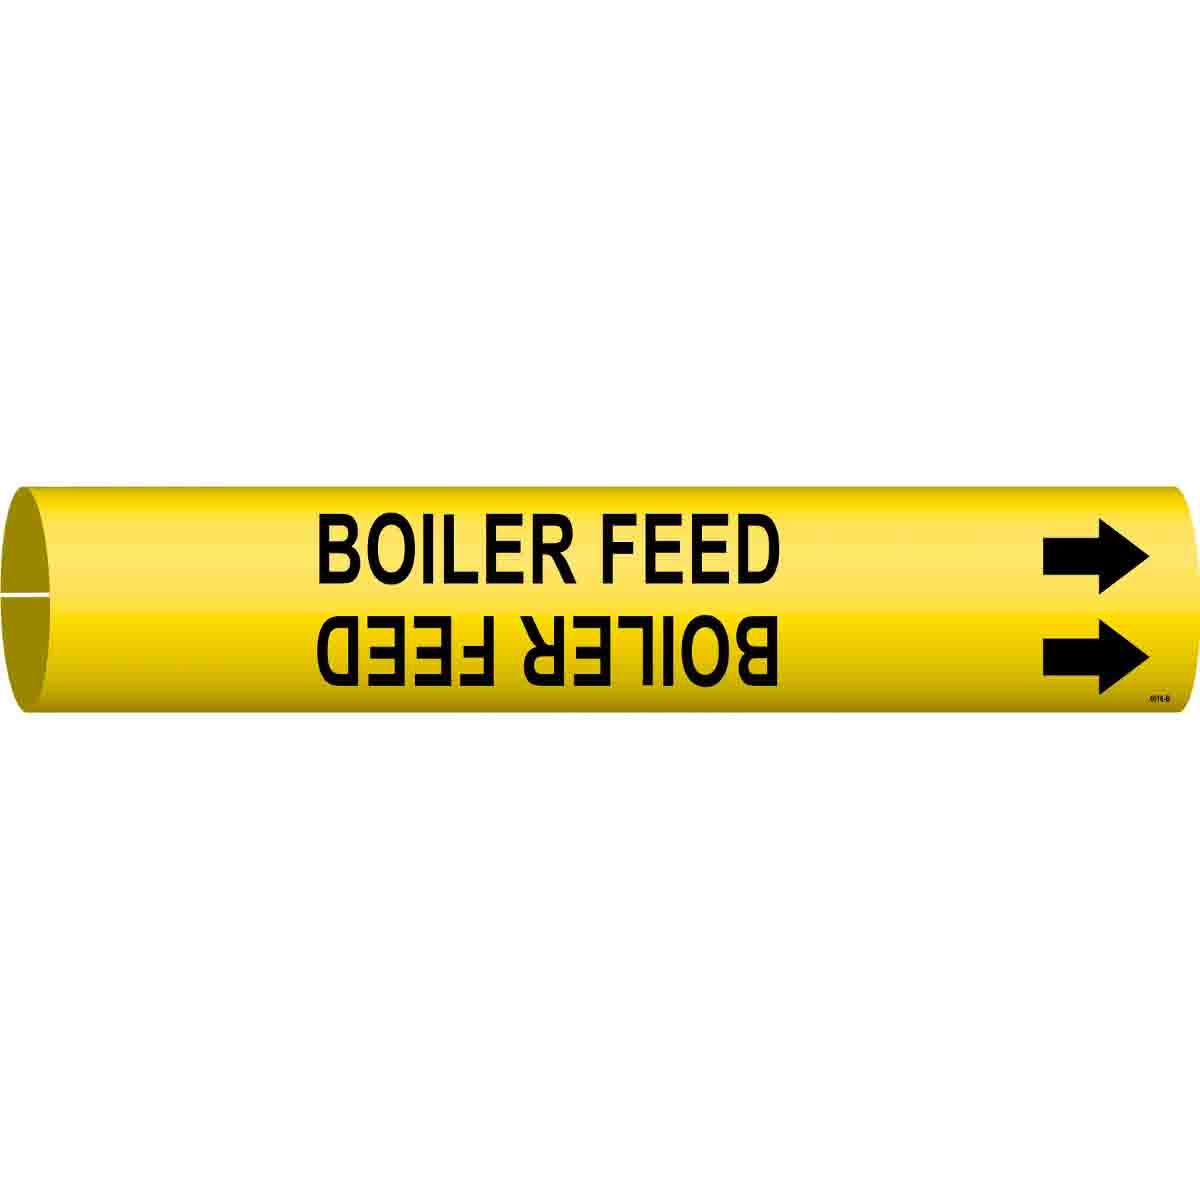 Brady 4016-H Brady Strap-On Pipe Marker Black On Yellow Printed Plastic Sheet Legend Boiler Feed B-915